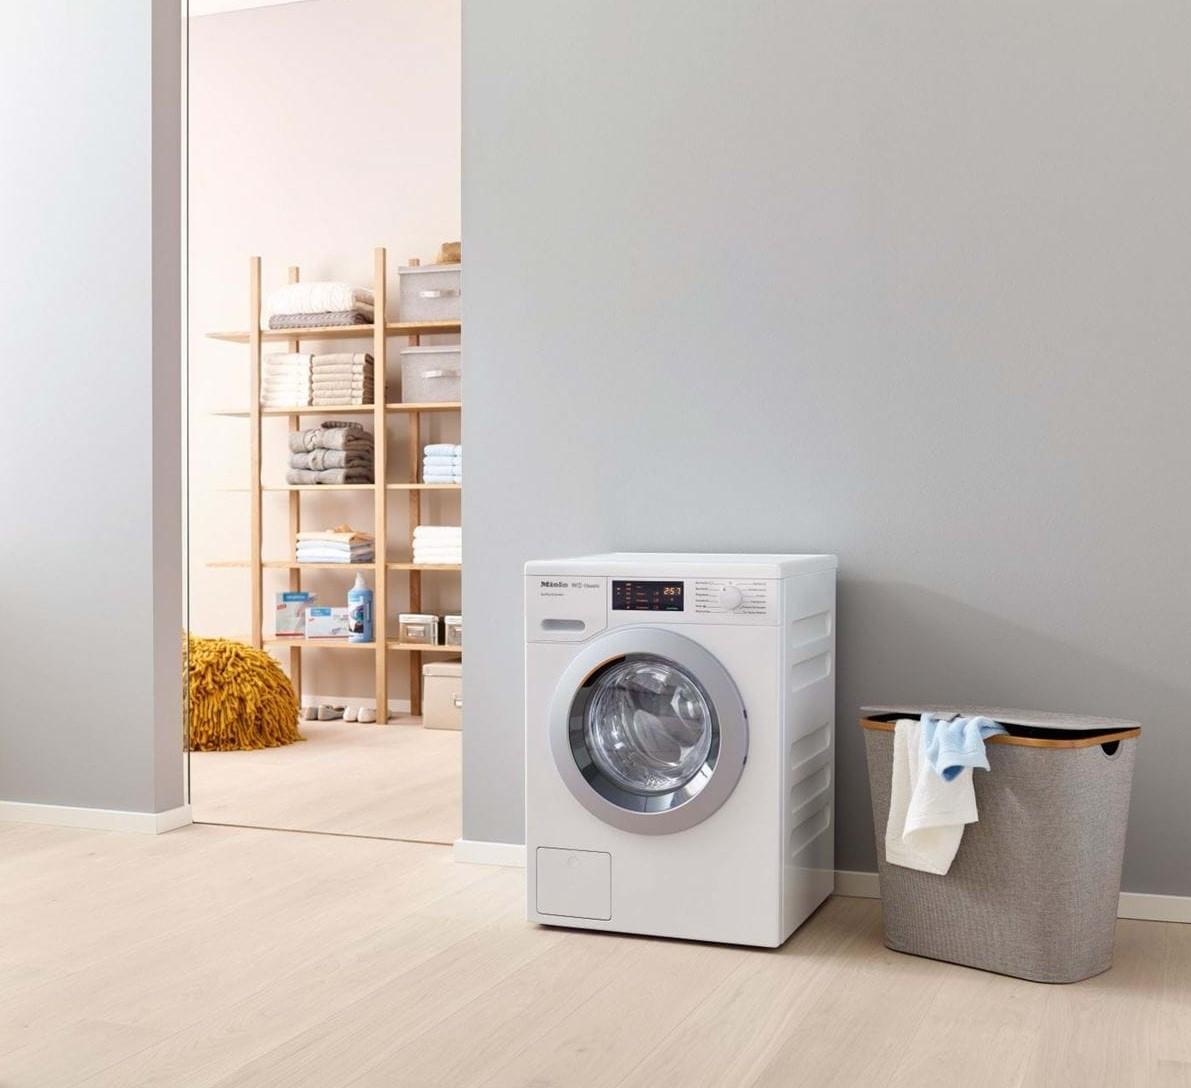 miele-wdb020nds-vaskemaskin